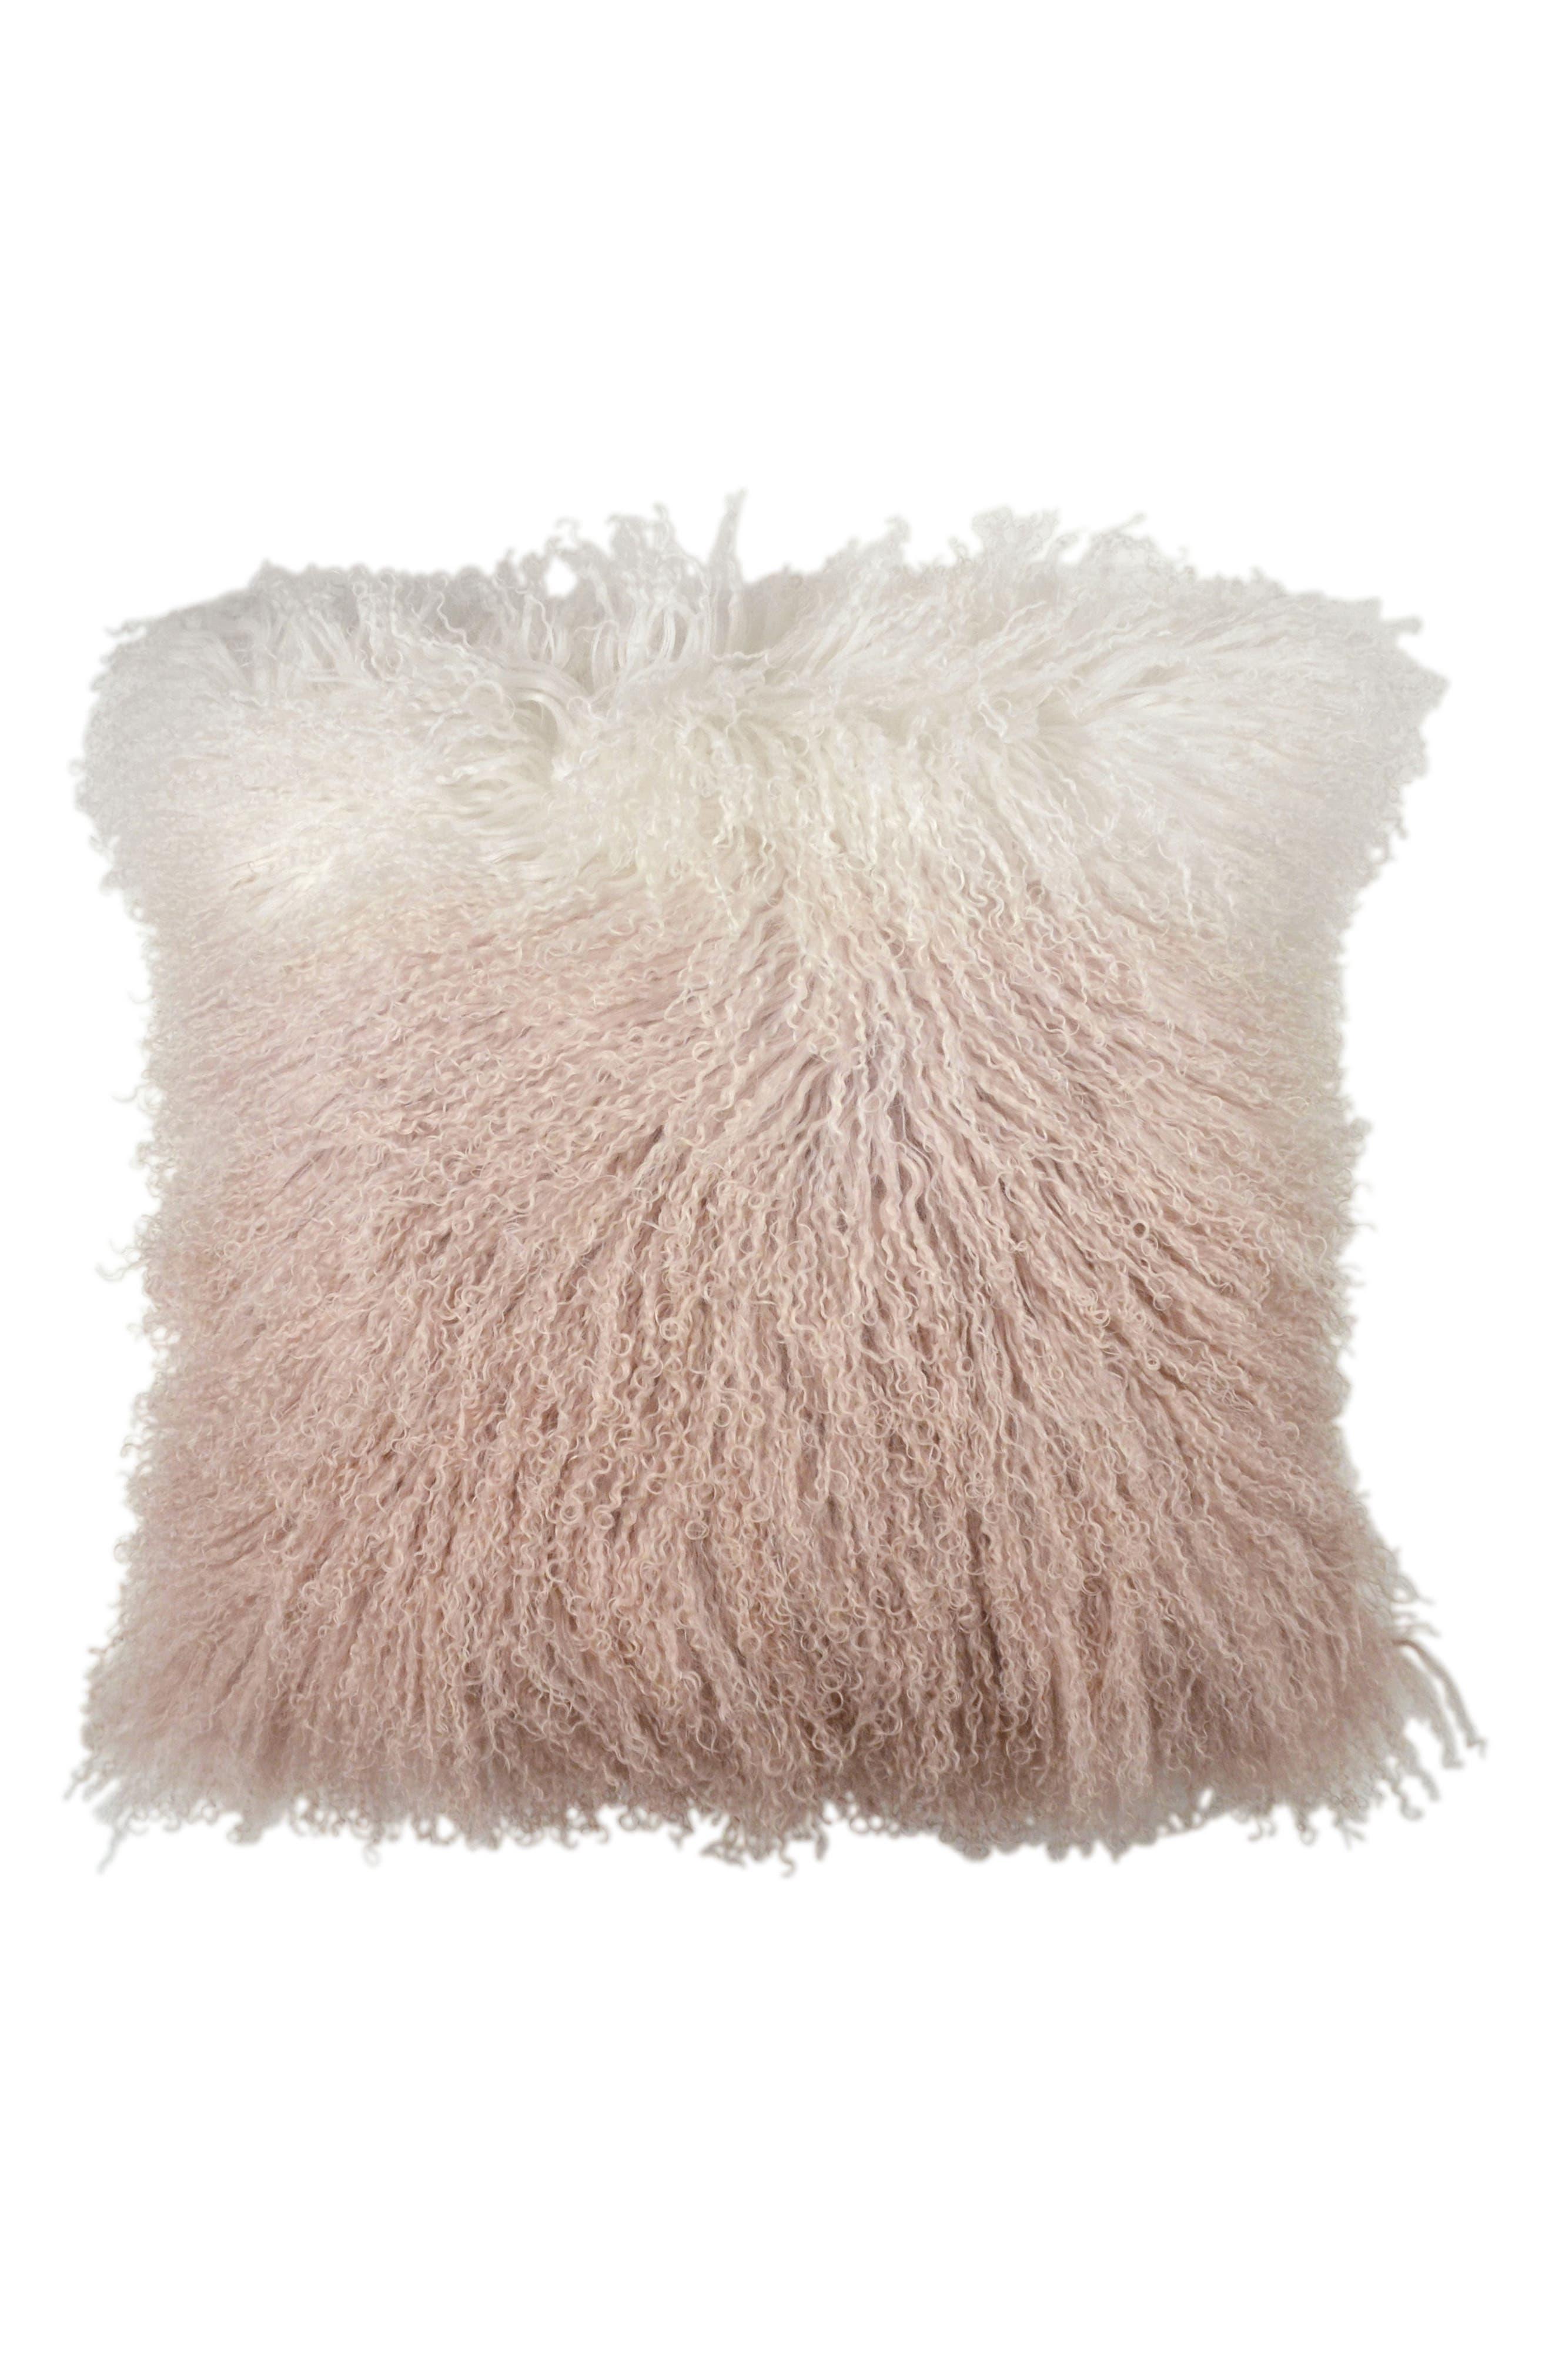 Dip Dye Sheepskin Accent Pillow,                         Main,                         color, BLUSH